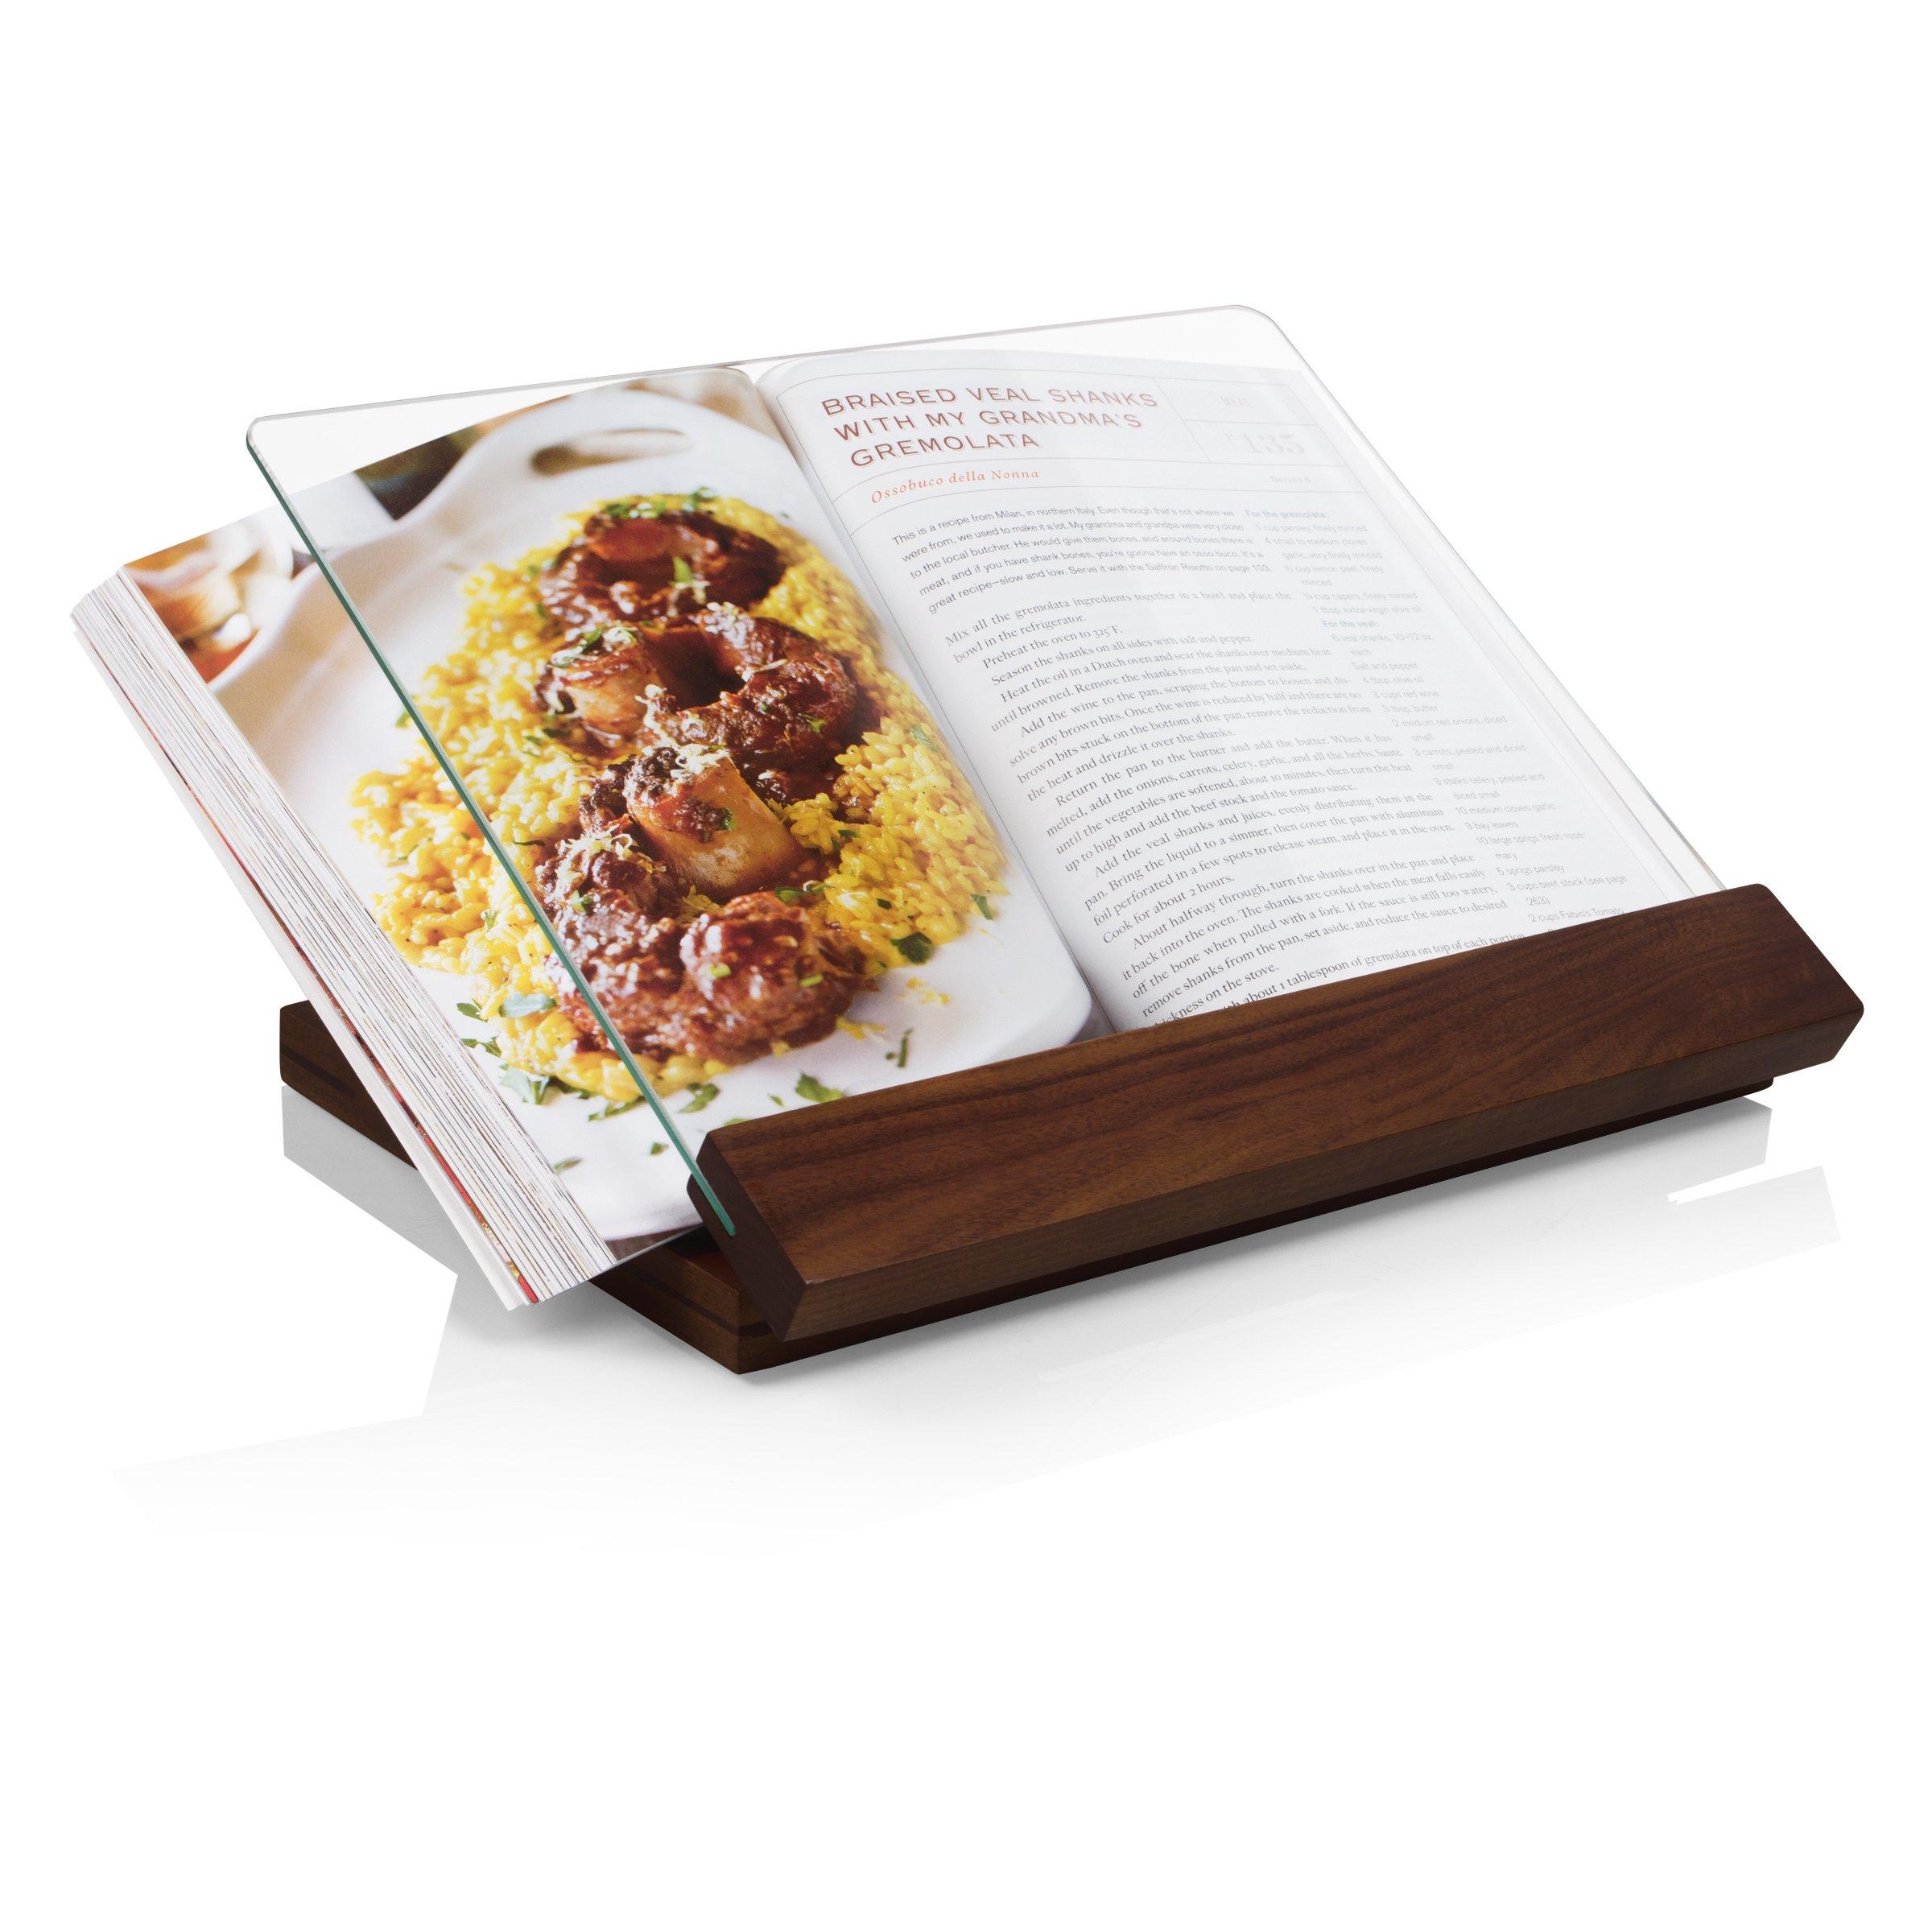 TOSCANA - a Picnic Time Brand Fabio Viviani Prodigio Acacia Wood Stand with Fabio's Signed Cookbook by TOSCANA - a Picnic Time brand